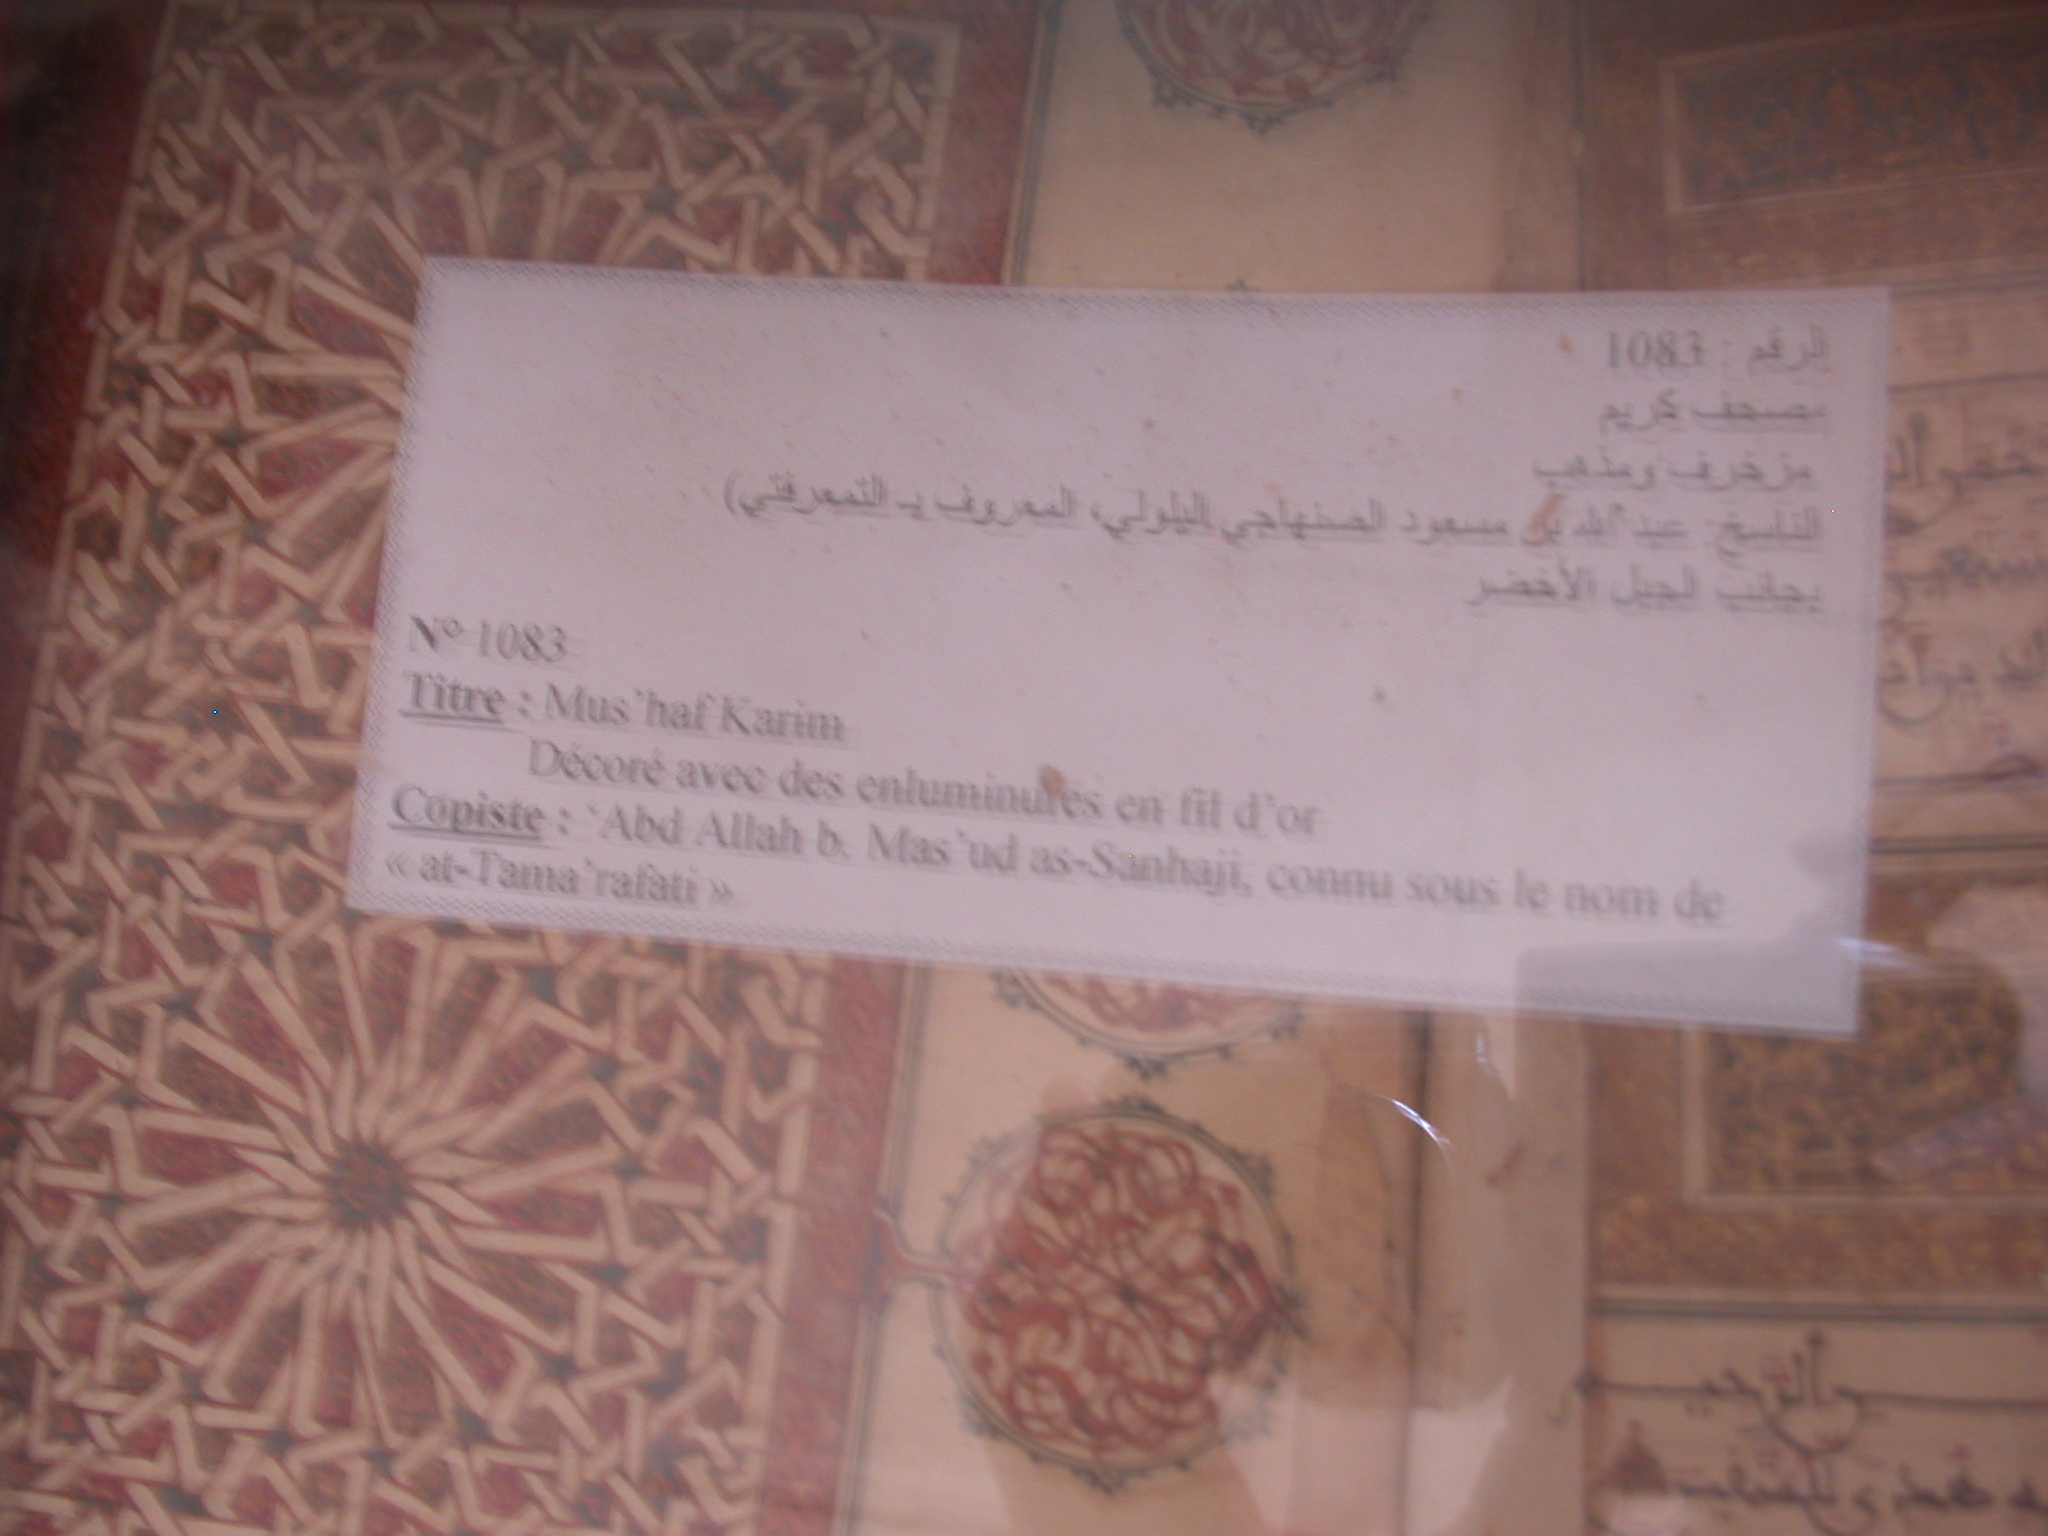 Photo of Manuscript, Mus haf Karim, Illuminated in Gold Leaf, Detail, Ahmed Baba Institute, Institut des Hautes Etudes et de Recherches Islamiques, Timbuktu, Mali